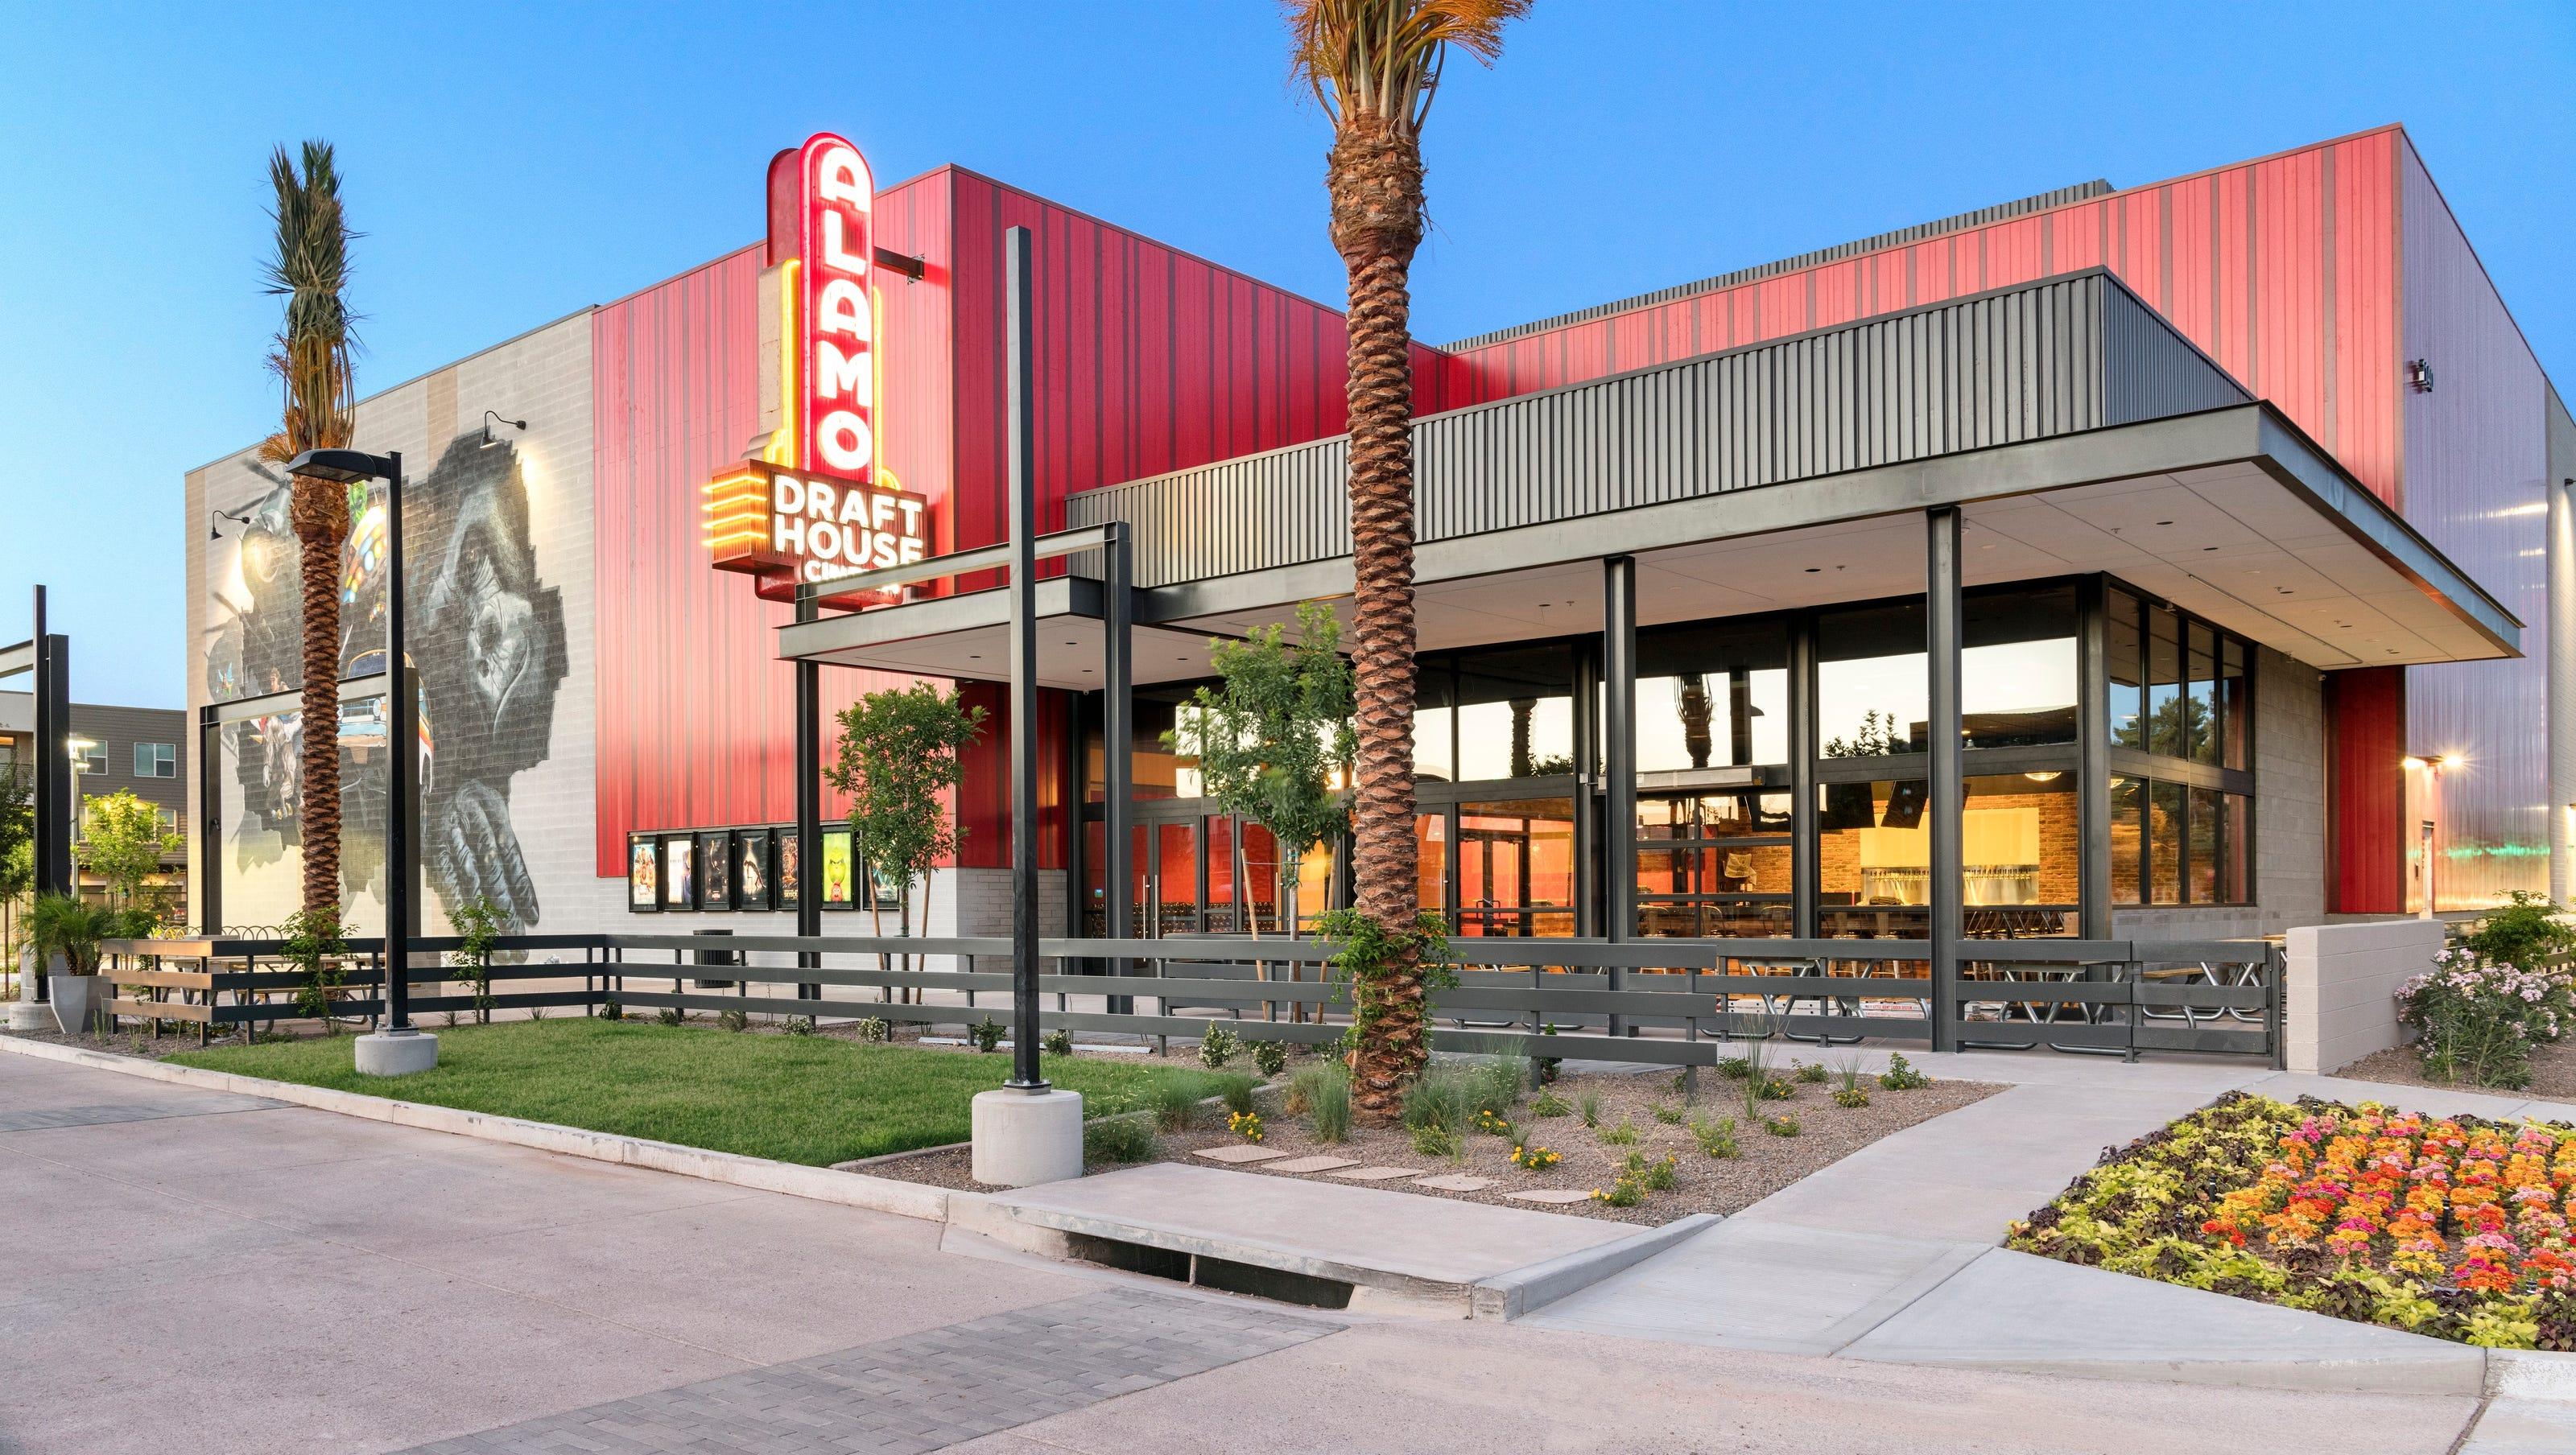 Alamo Drafthouse movie theater coming to Gilbert Alamo Drafthouse